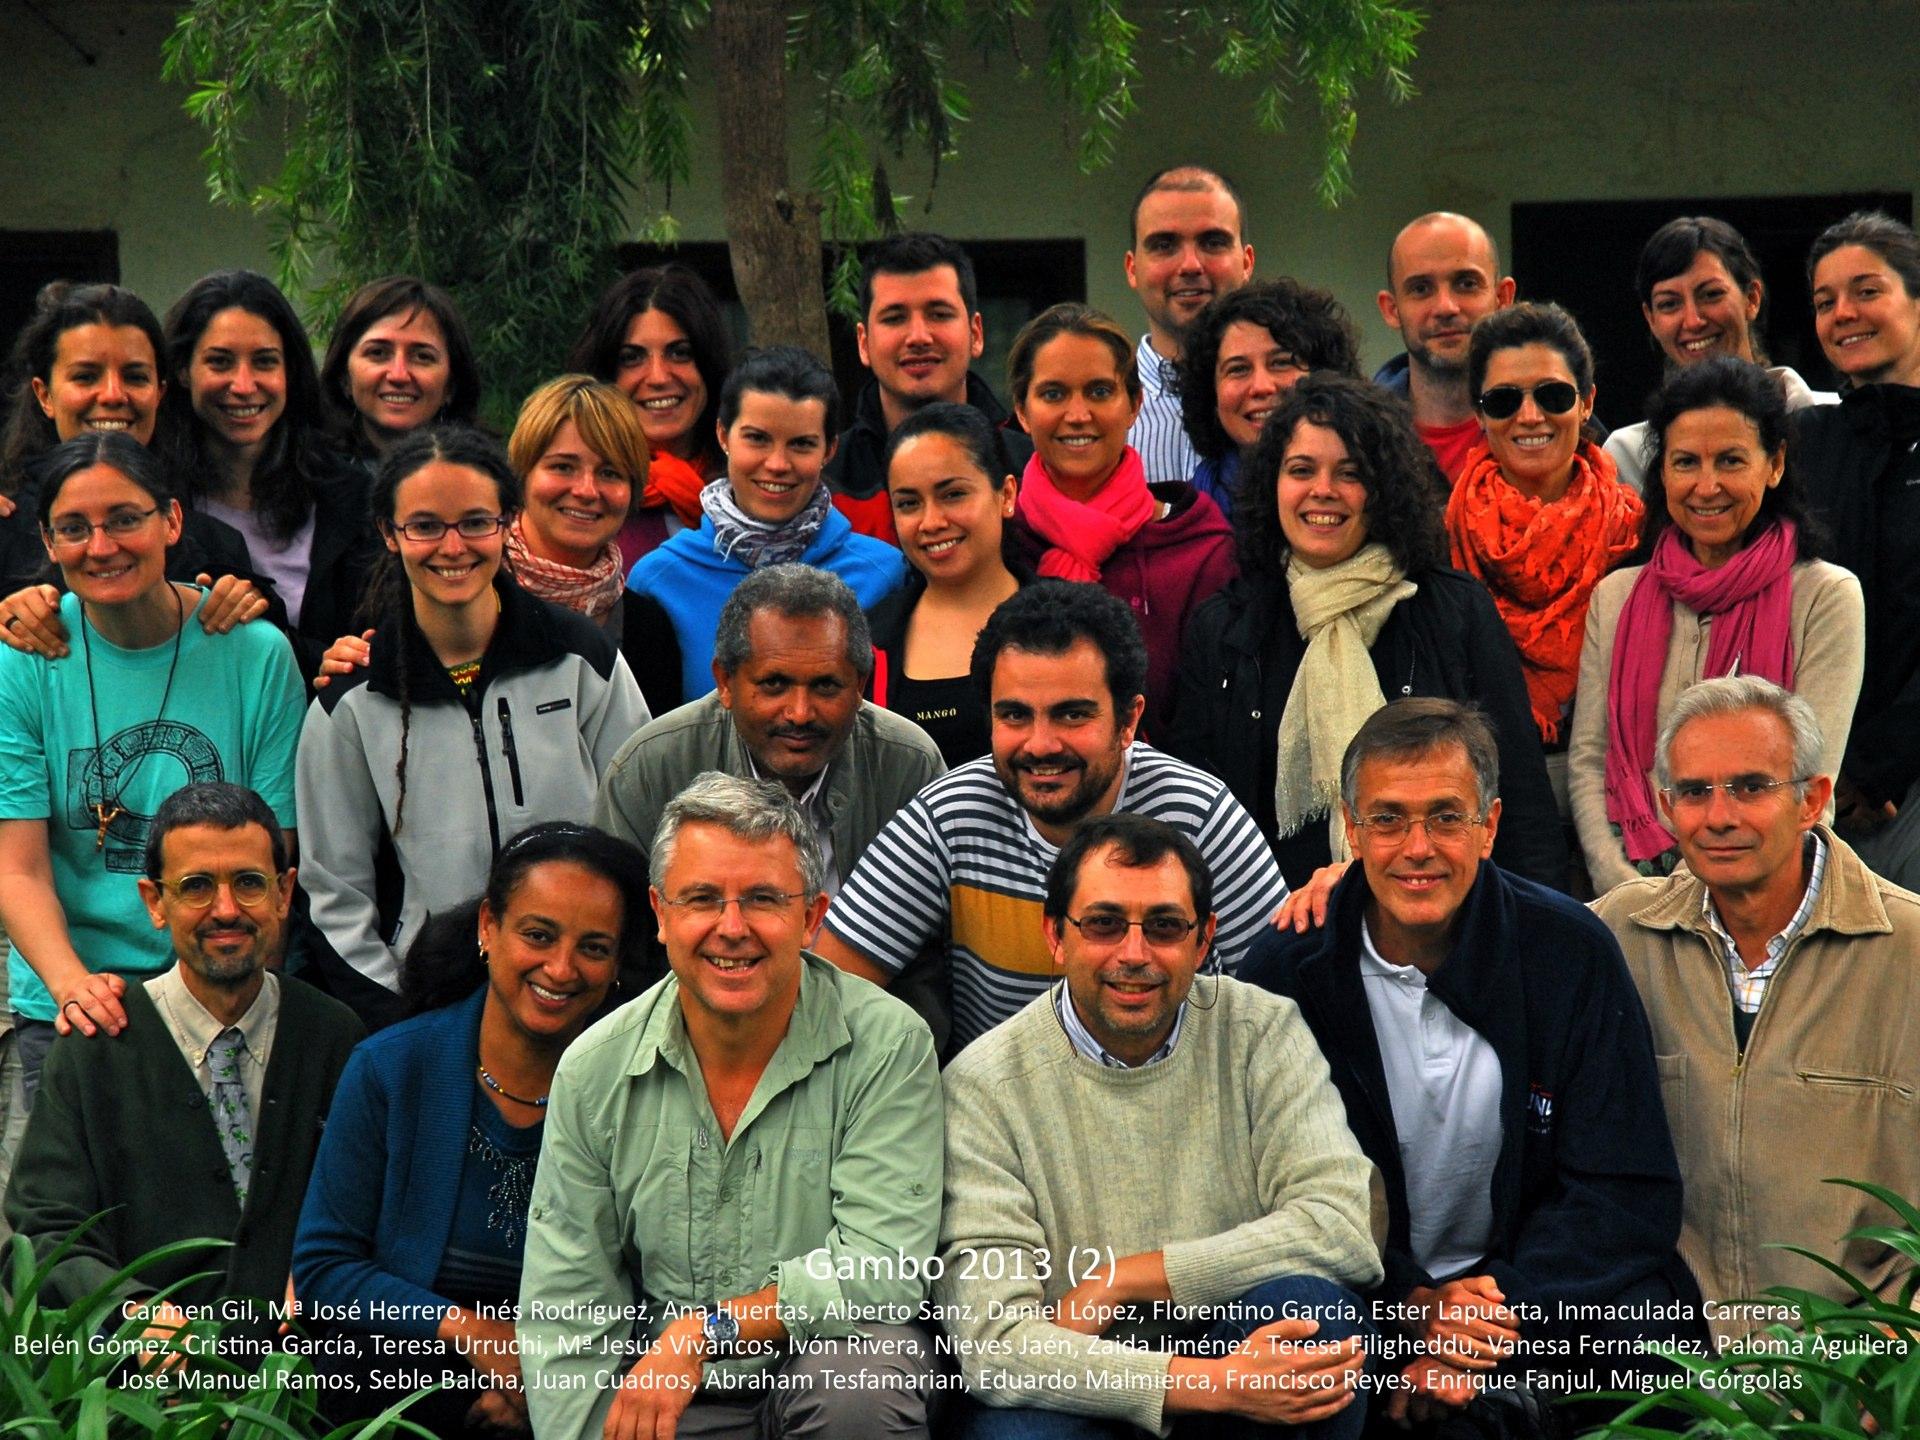 Foto grupo 2013 2